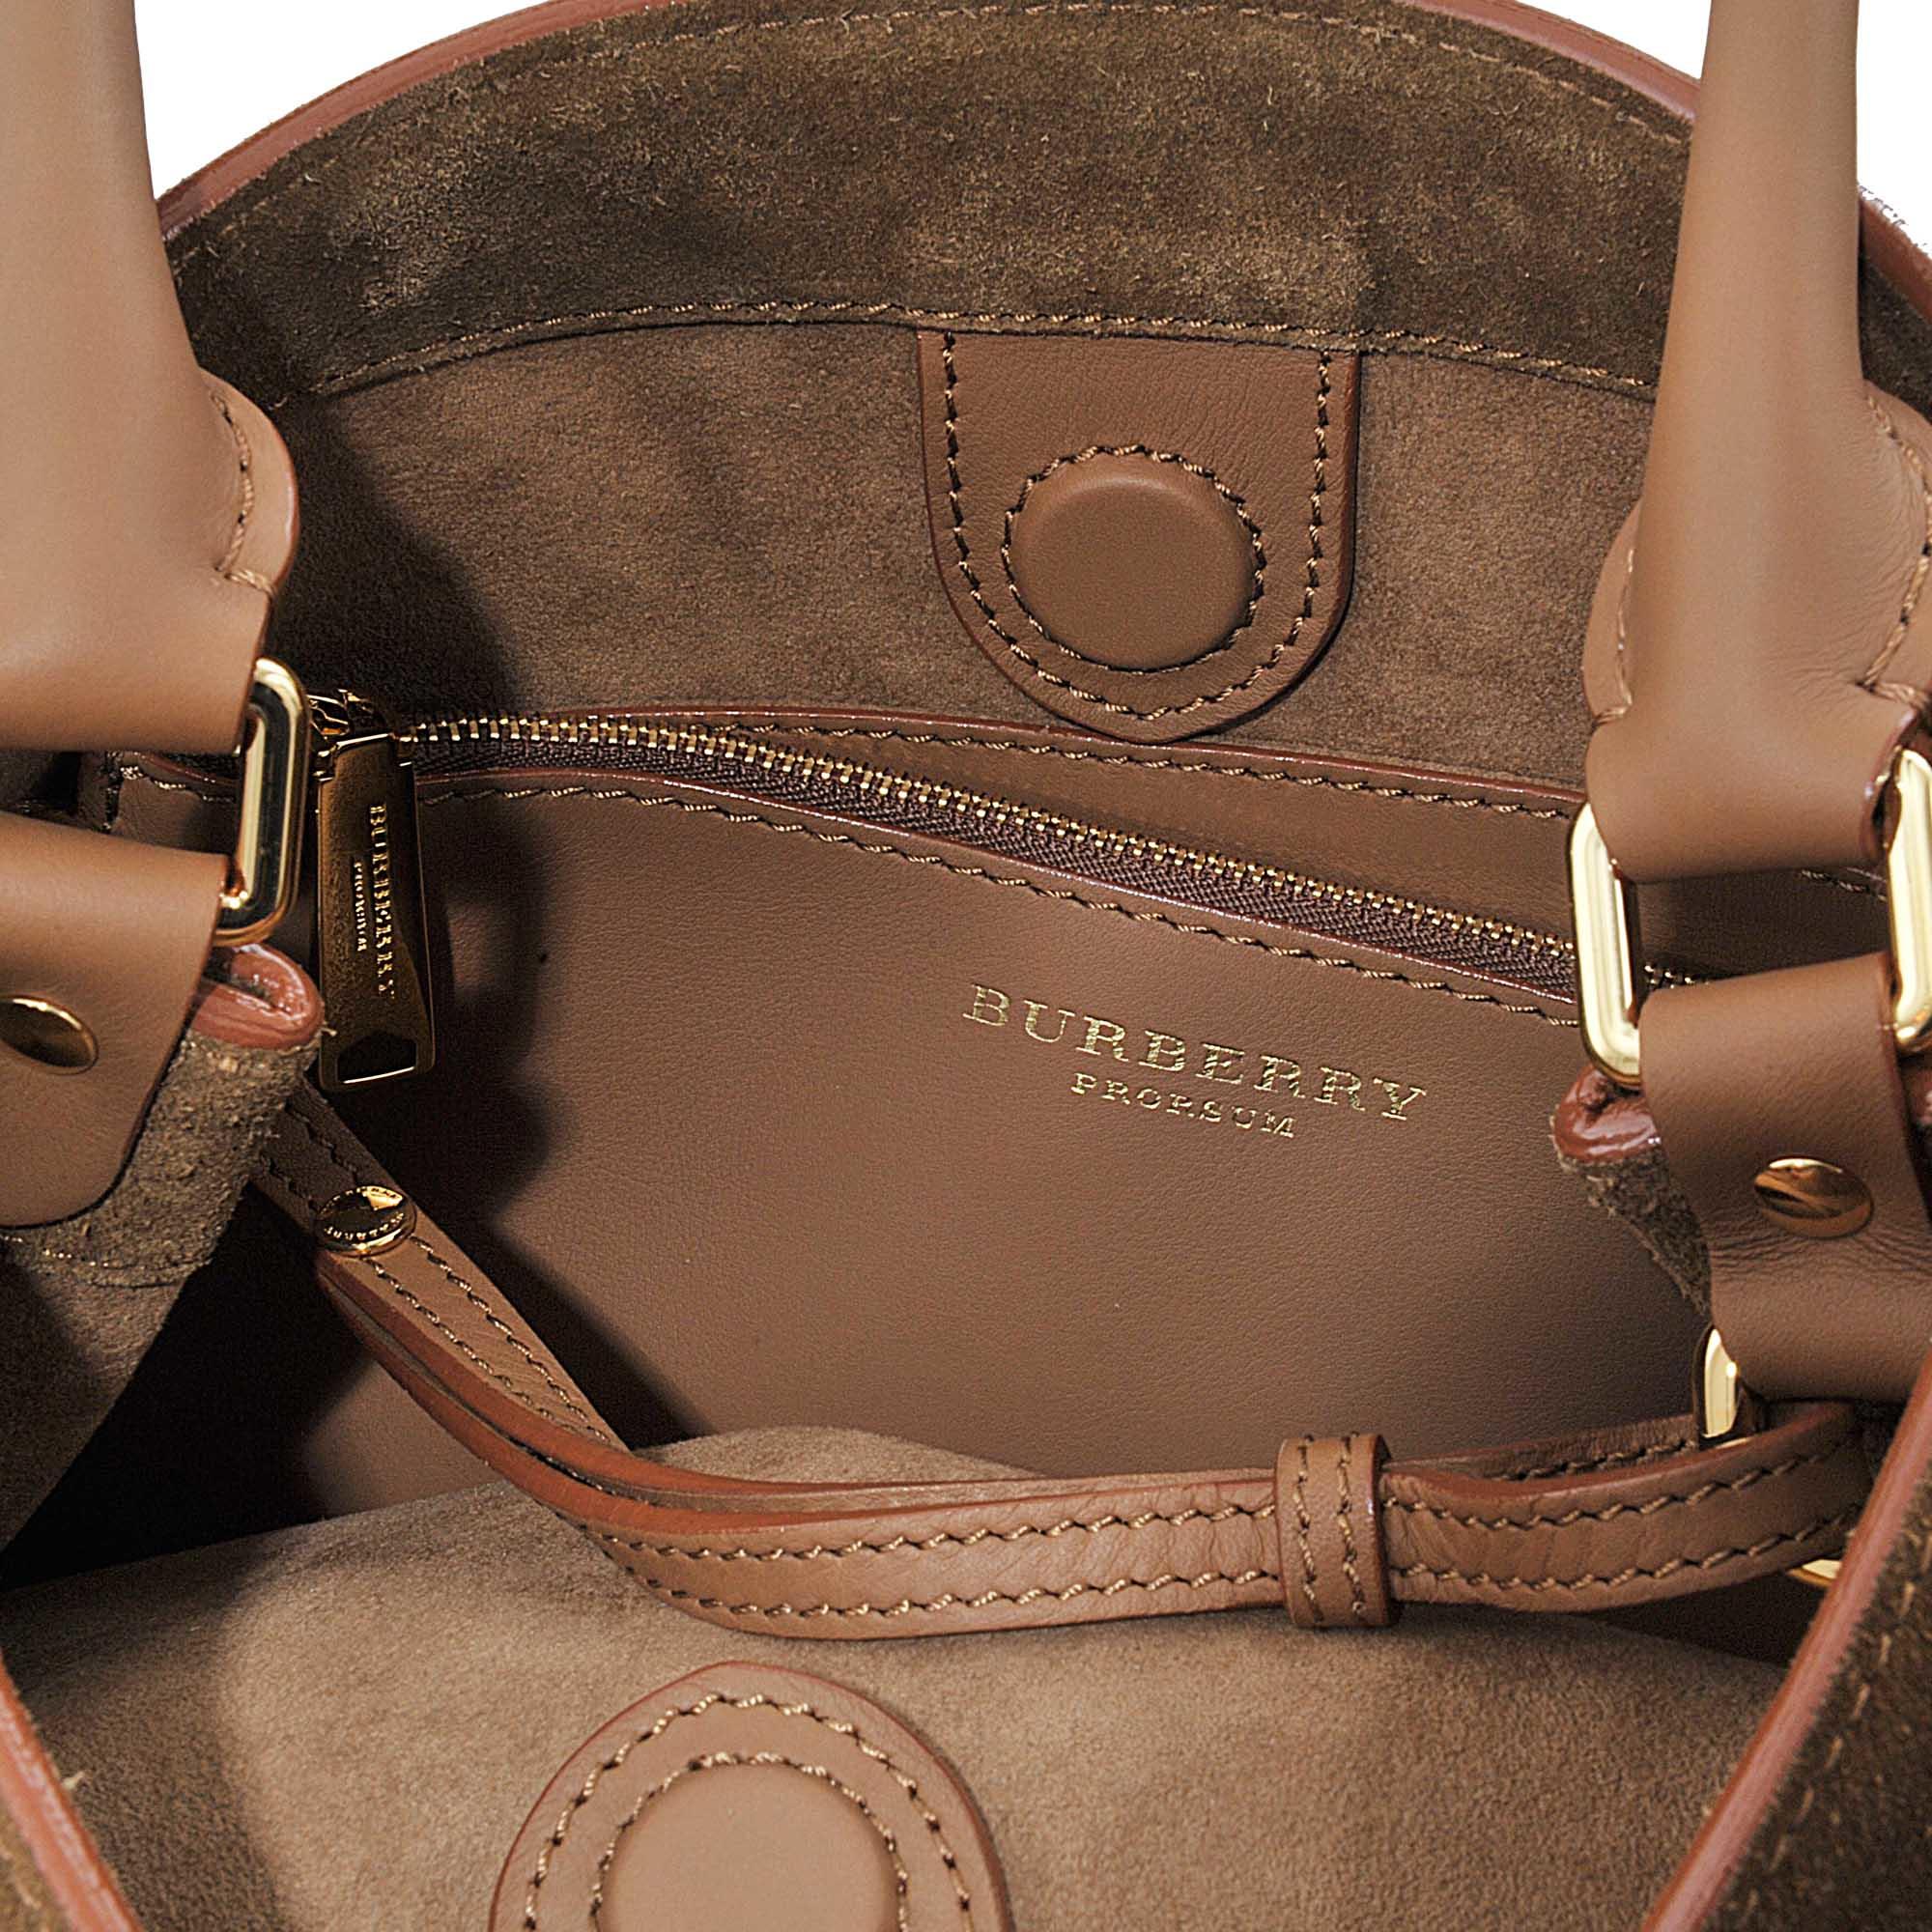 b2528bd032da Lyst - Burberry Prorsum Housecheck Bucket Bag With Fringe in Brown